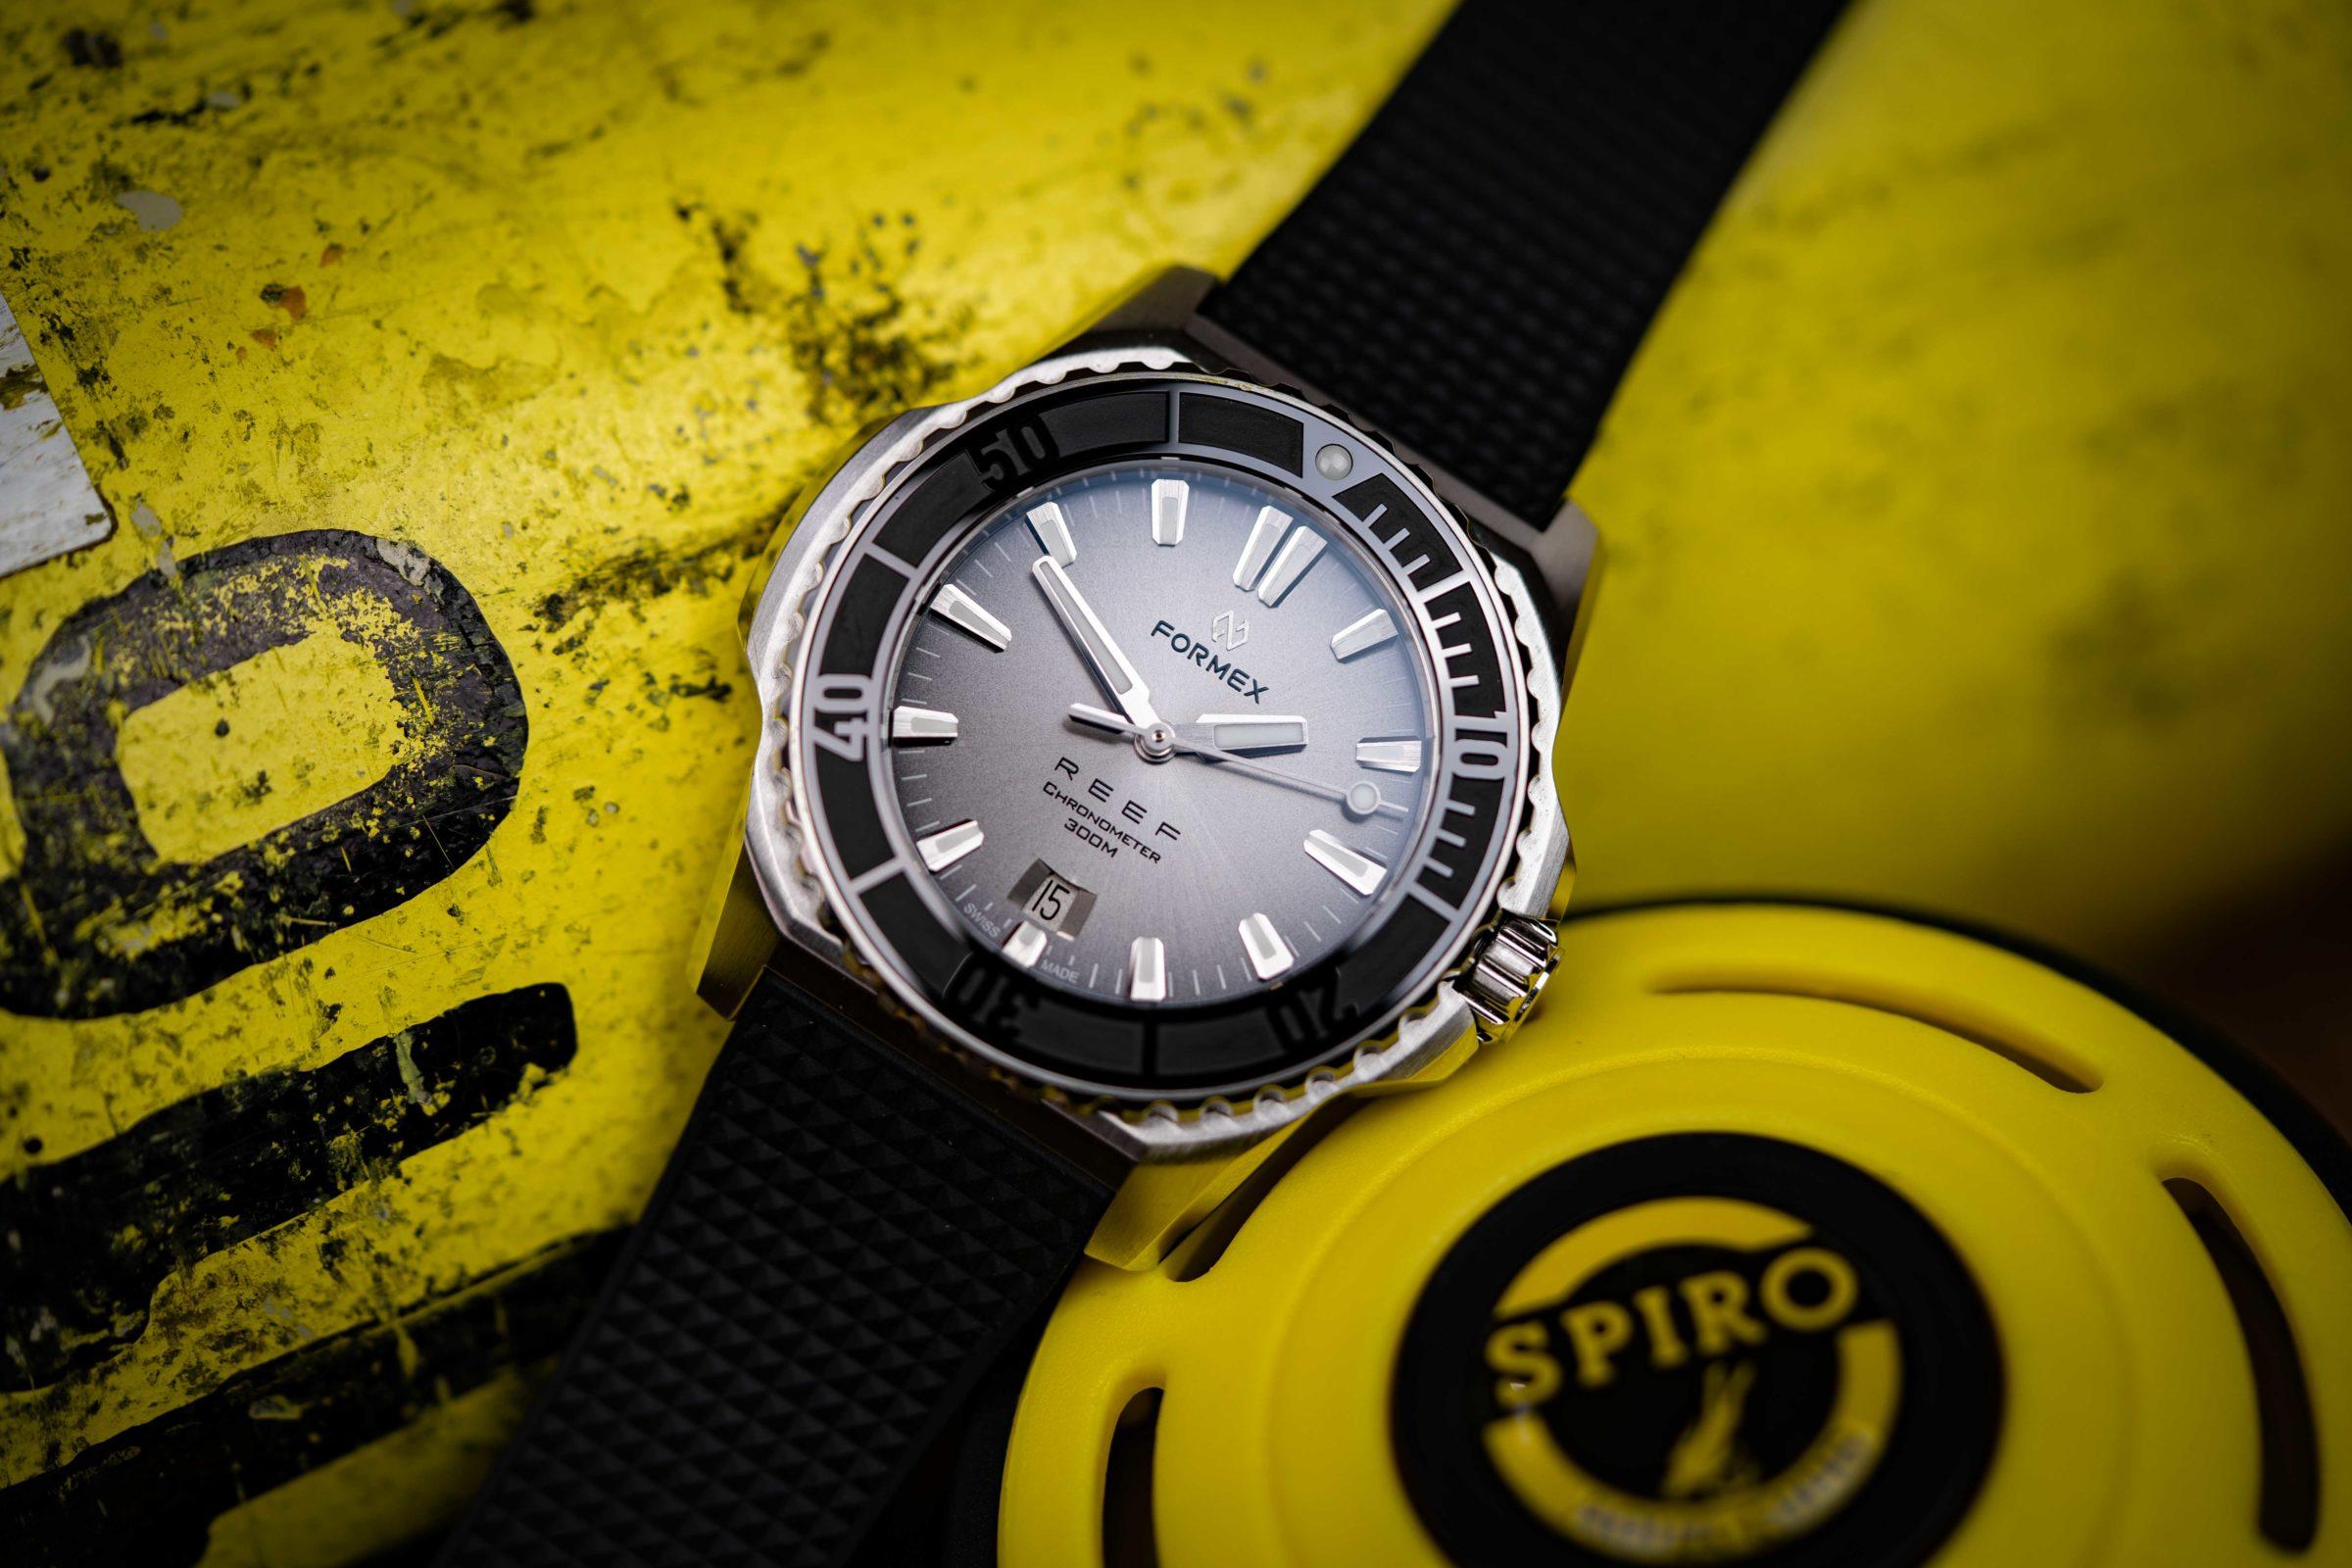 Formex-Reef-Automatik-Chronometer-300m-Taucheruhr-Test-2